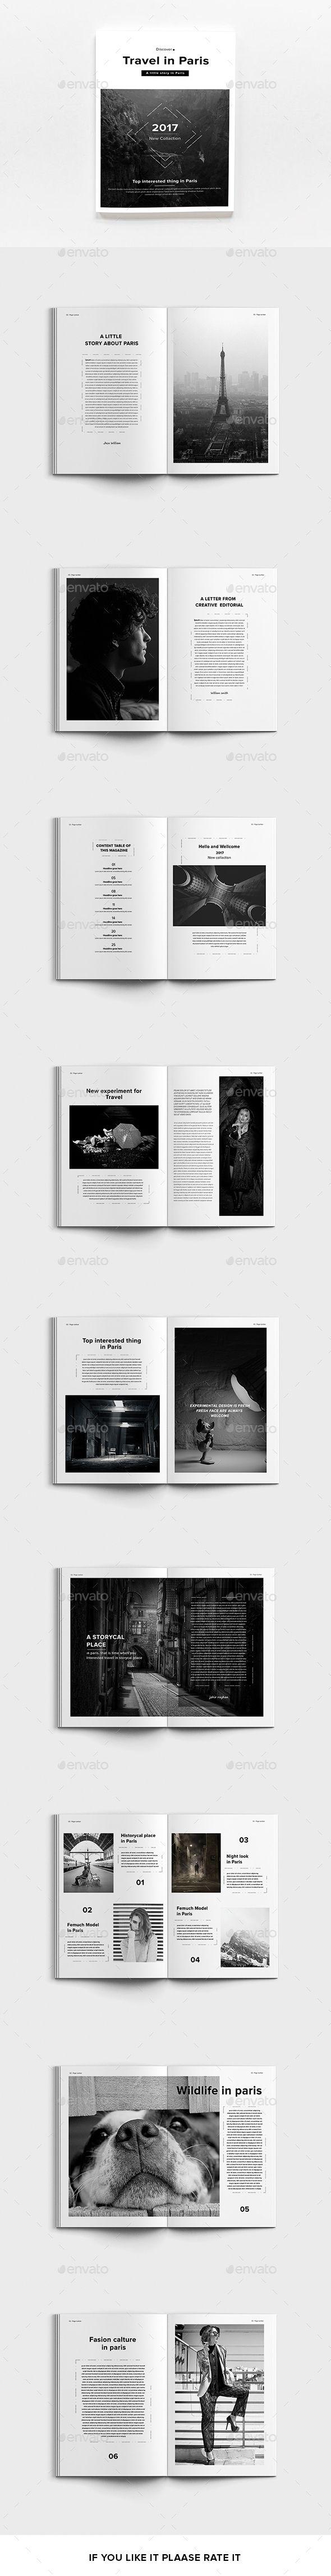 Layout photoshop web design website template tutorials tutorial 022 - Travel In Paris Magazines Print Templates Download Here Https Graphicriver